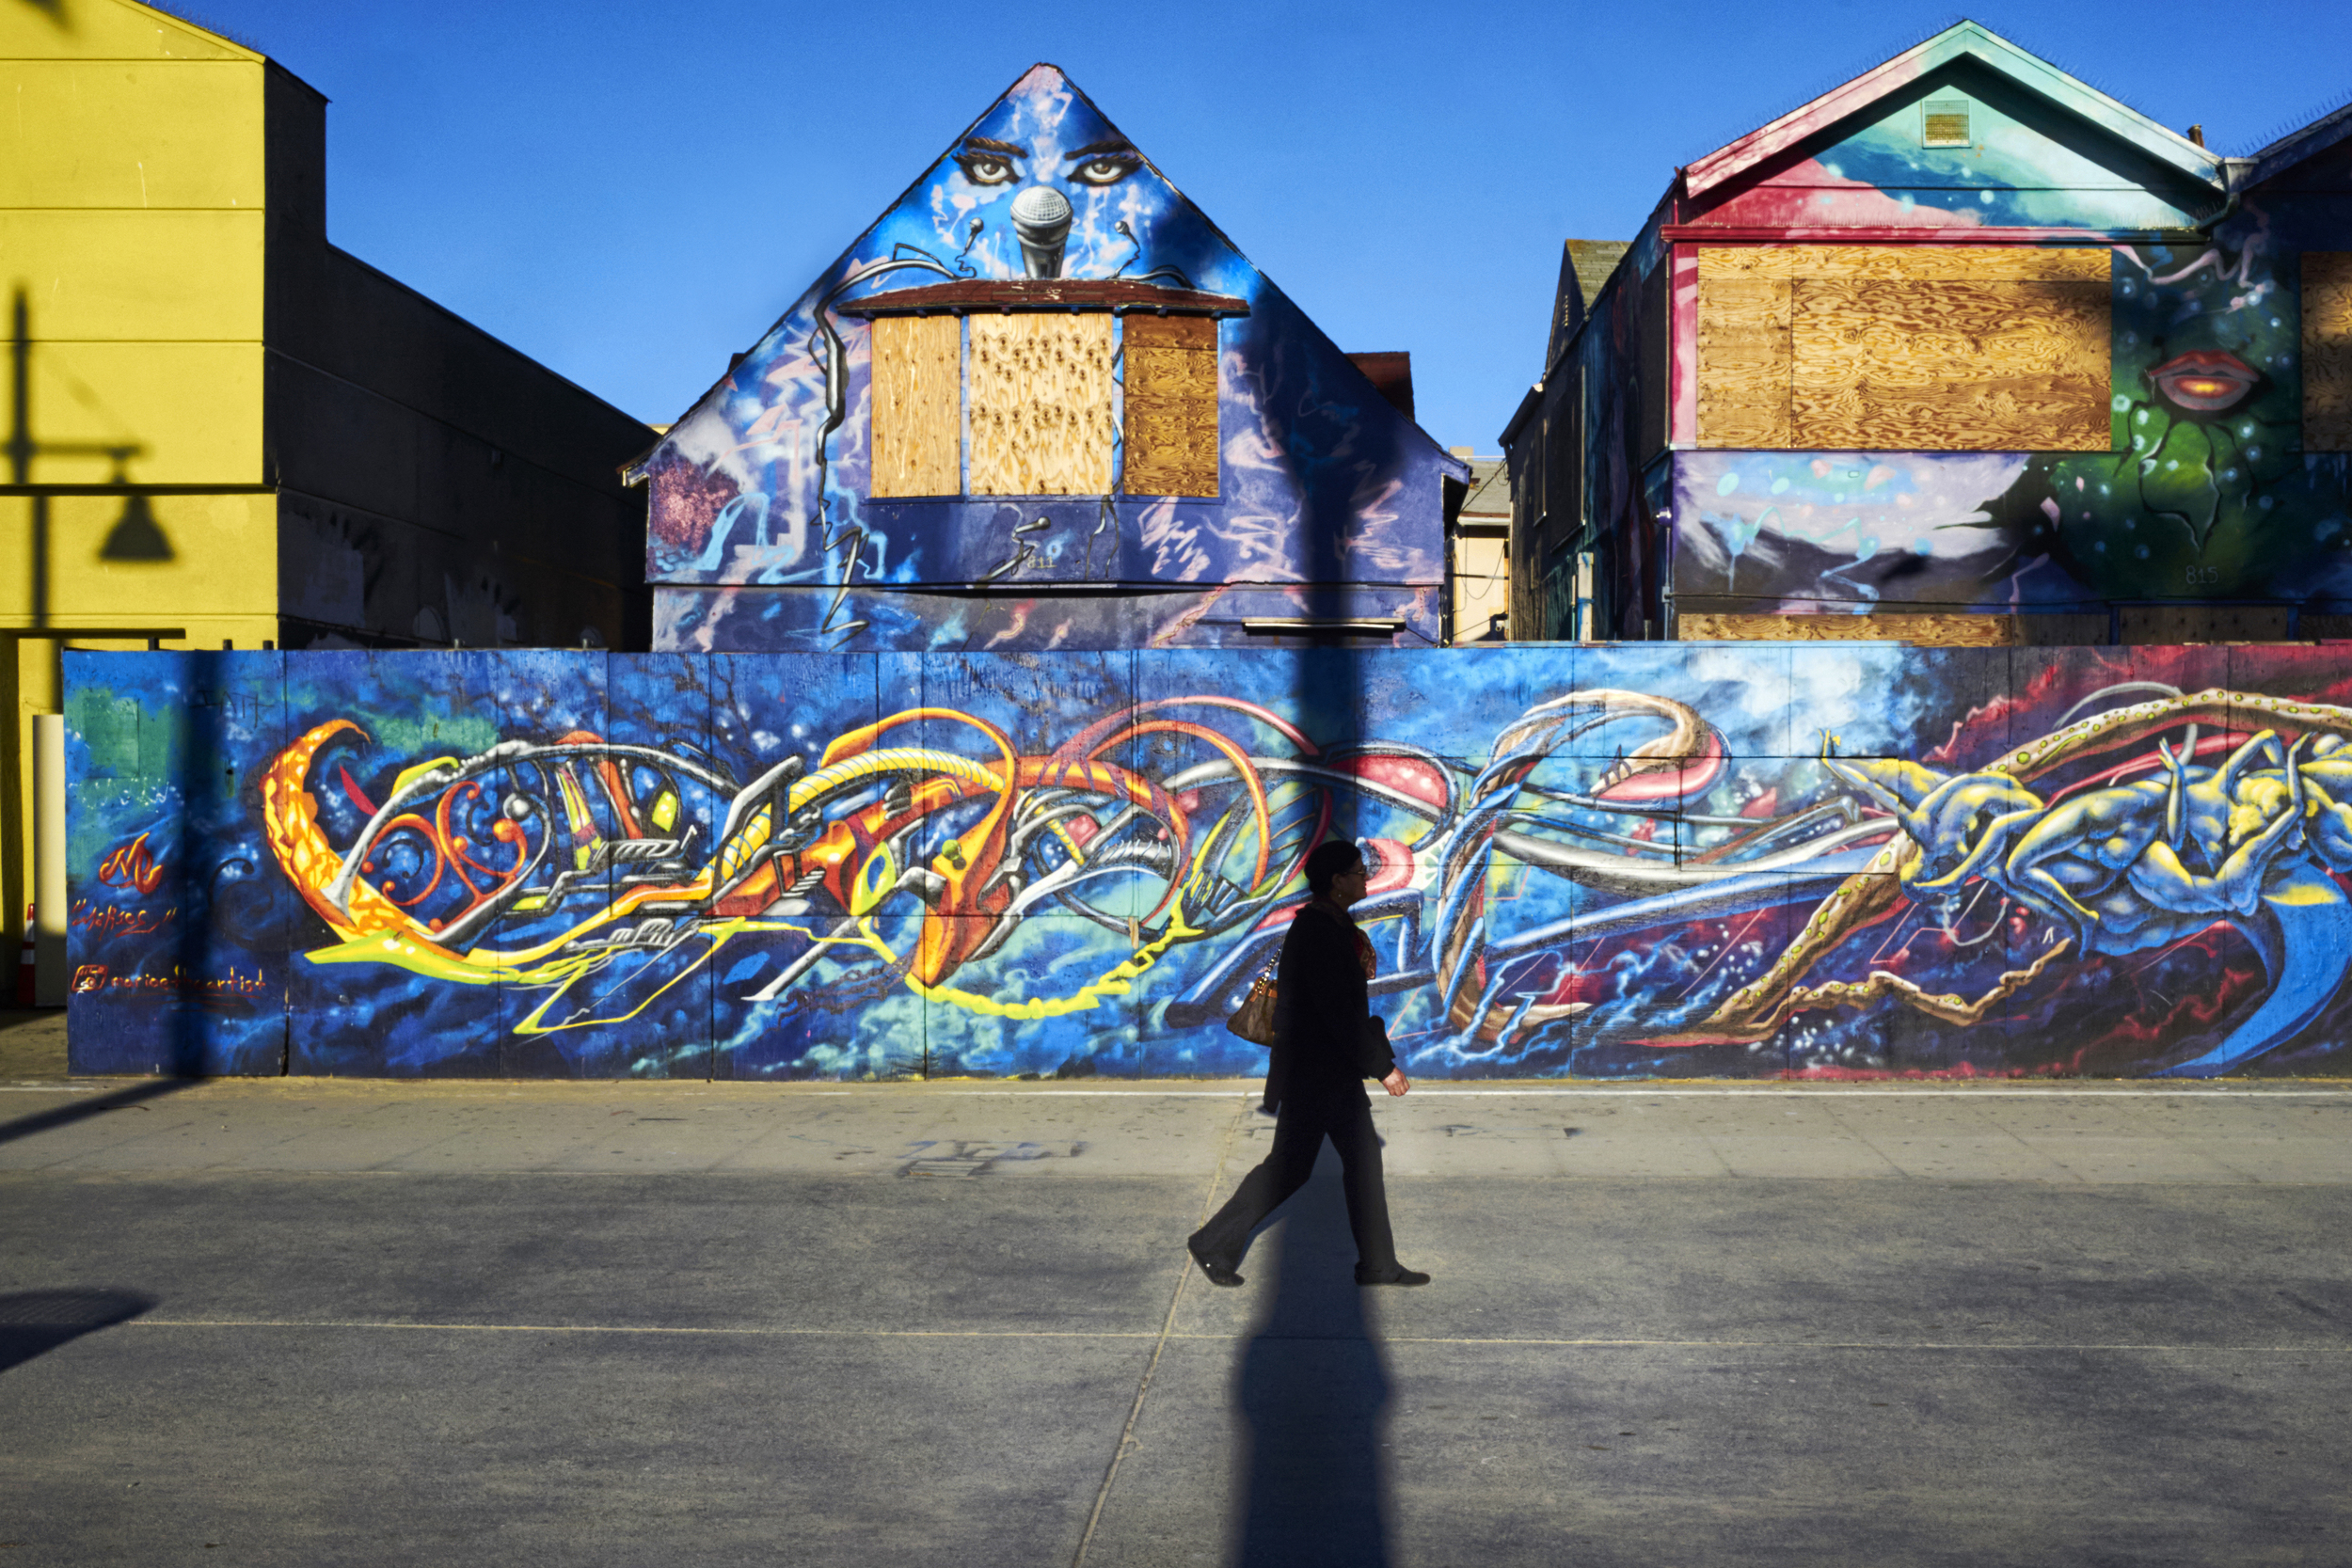 ingonito-man-walks-down-venice-boardwalk.jpg